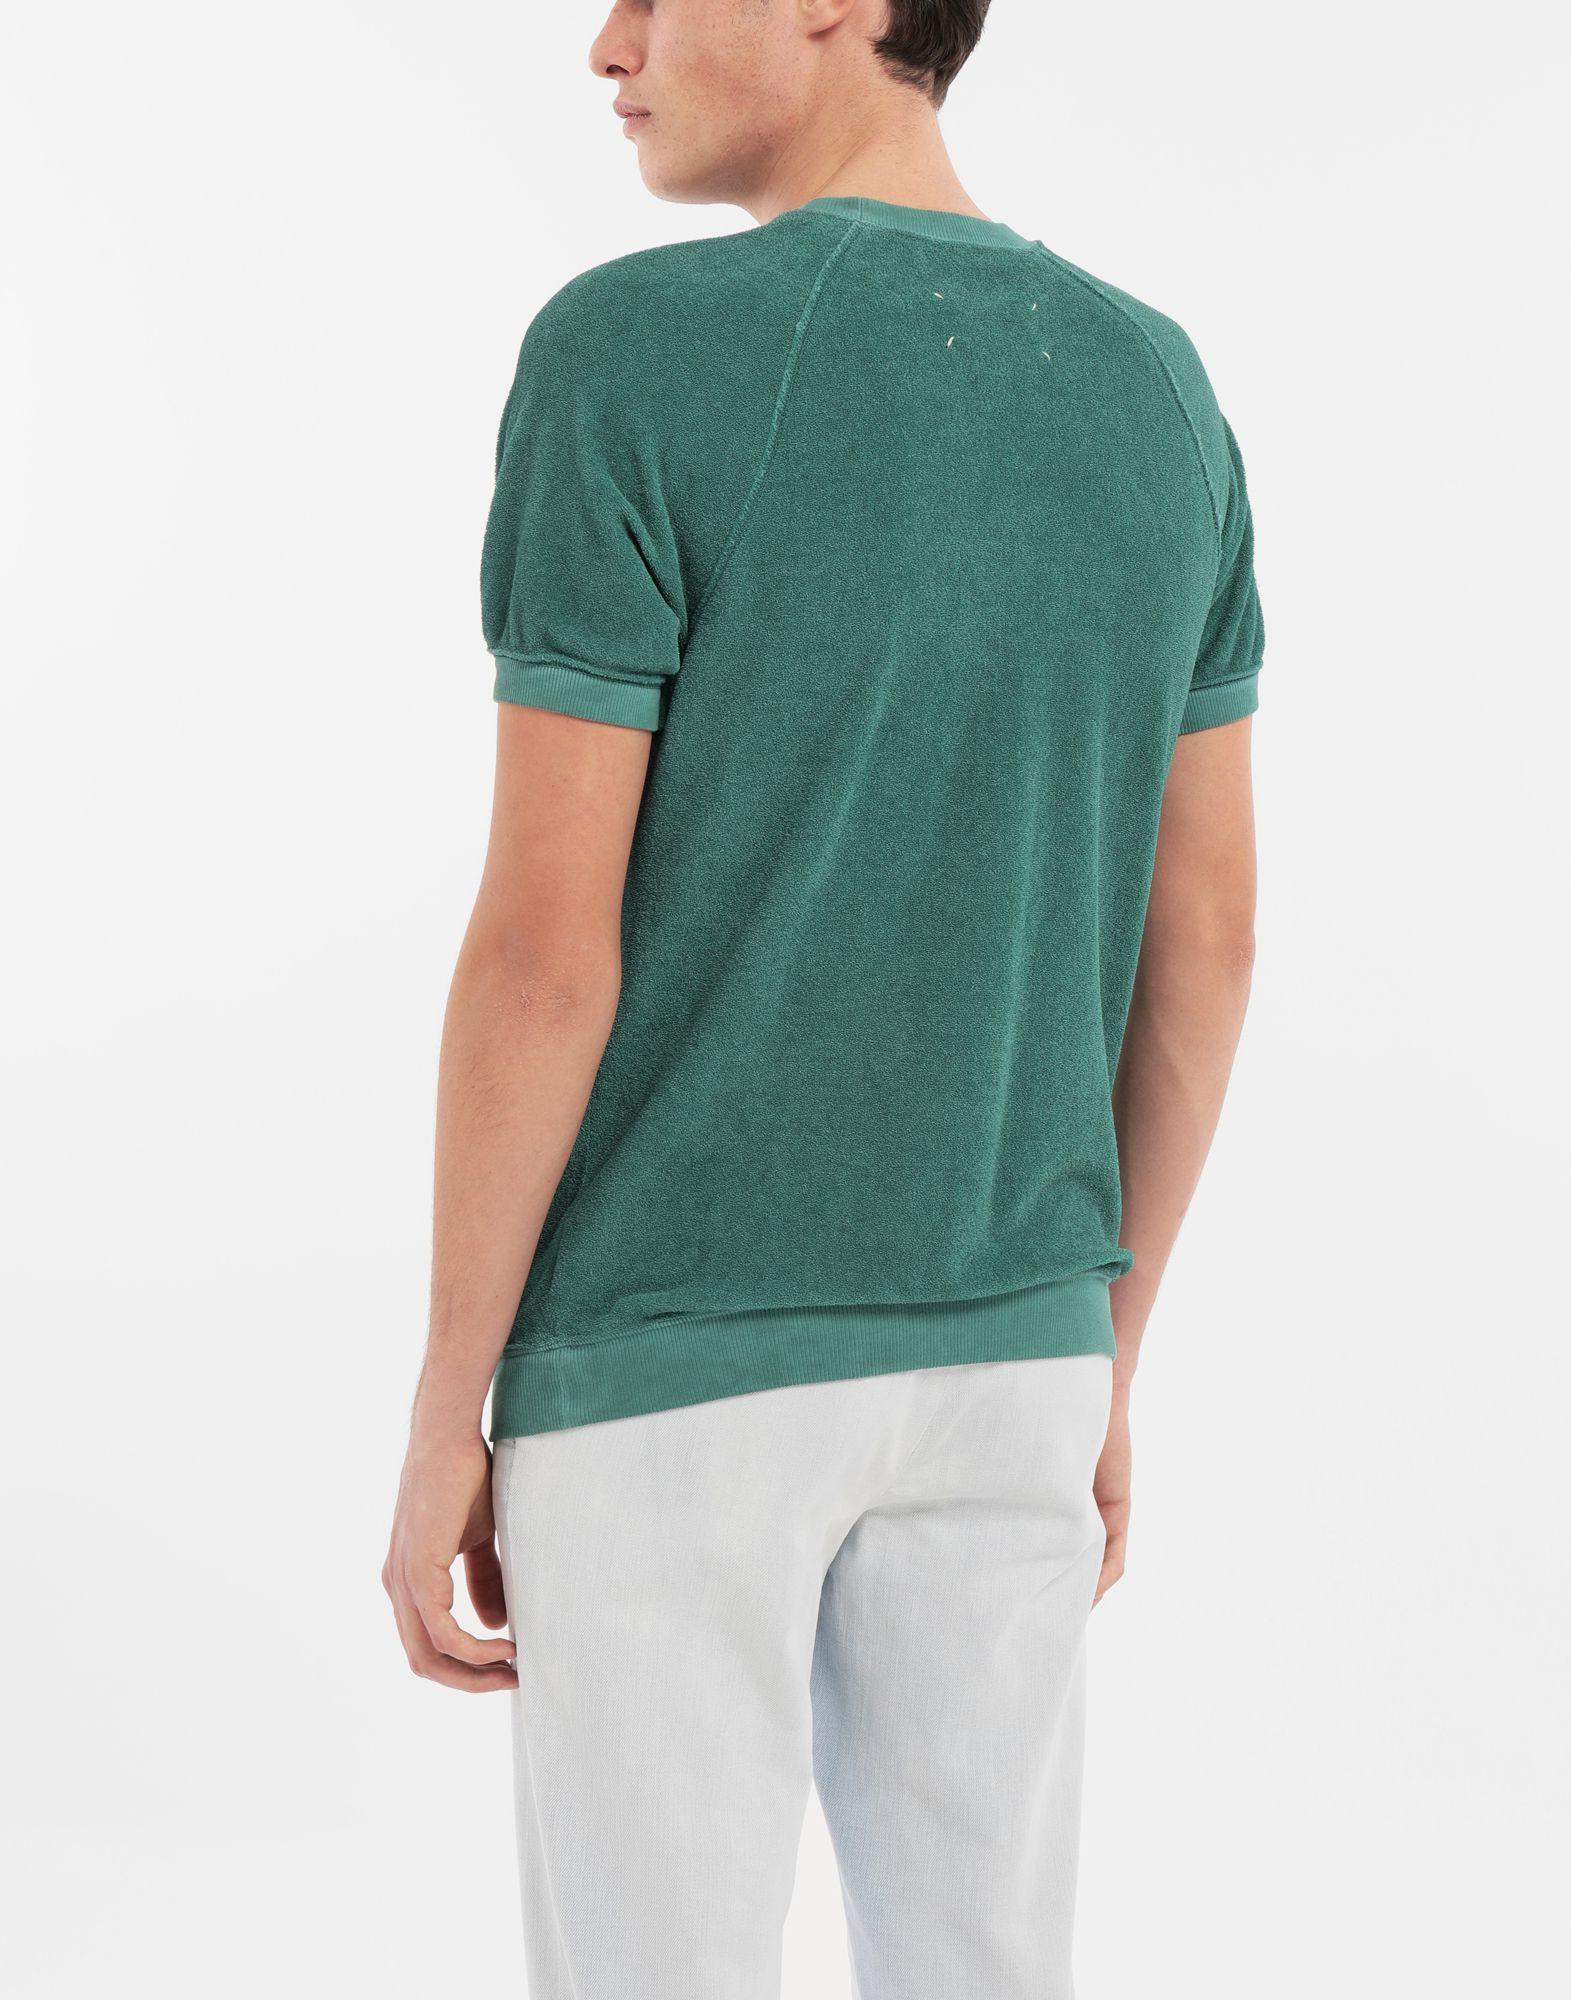 MAISON MARGIELA Graphic printed faded T-shirt Sweatshirt Man e